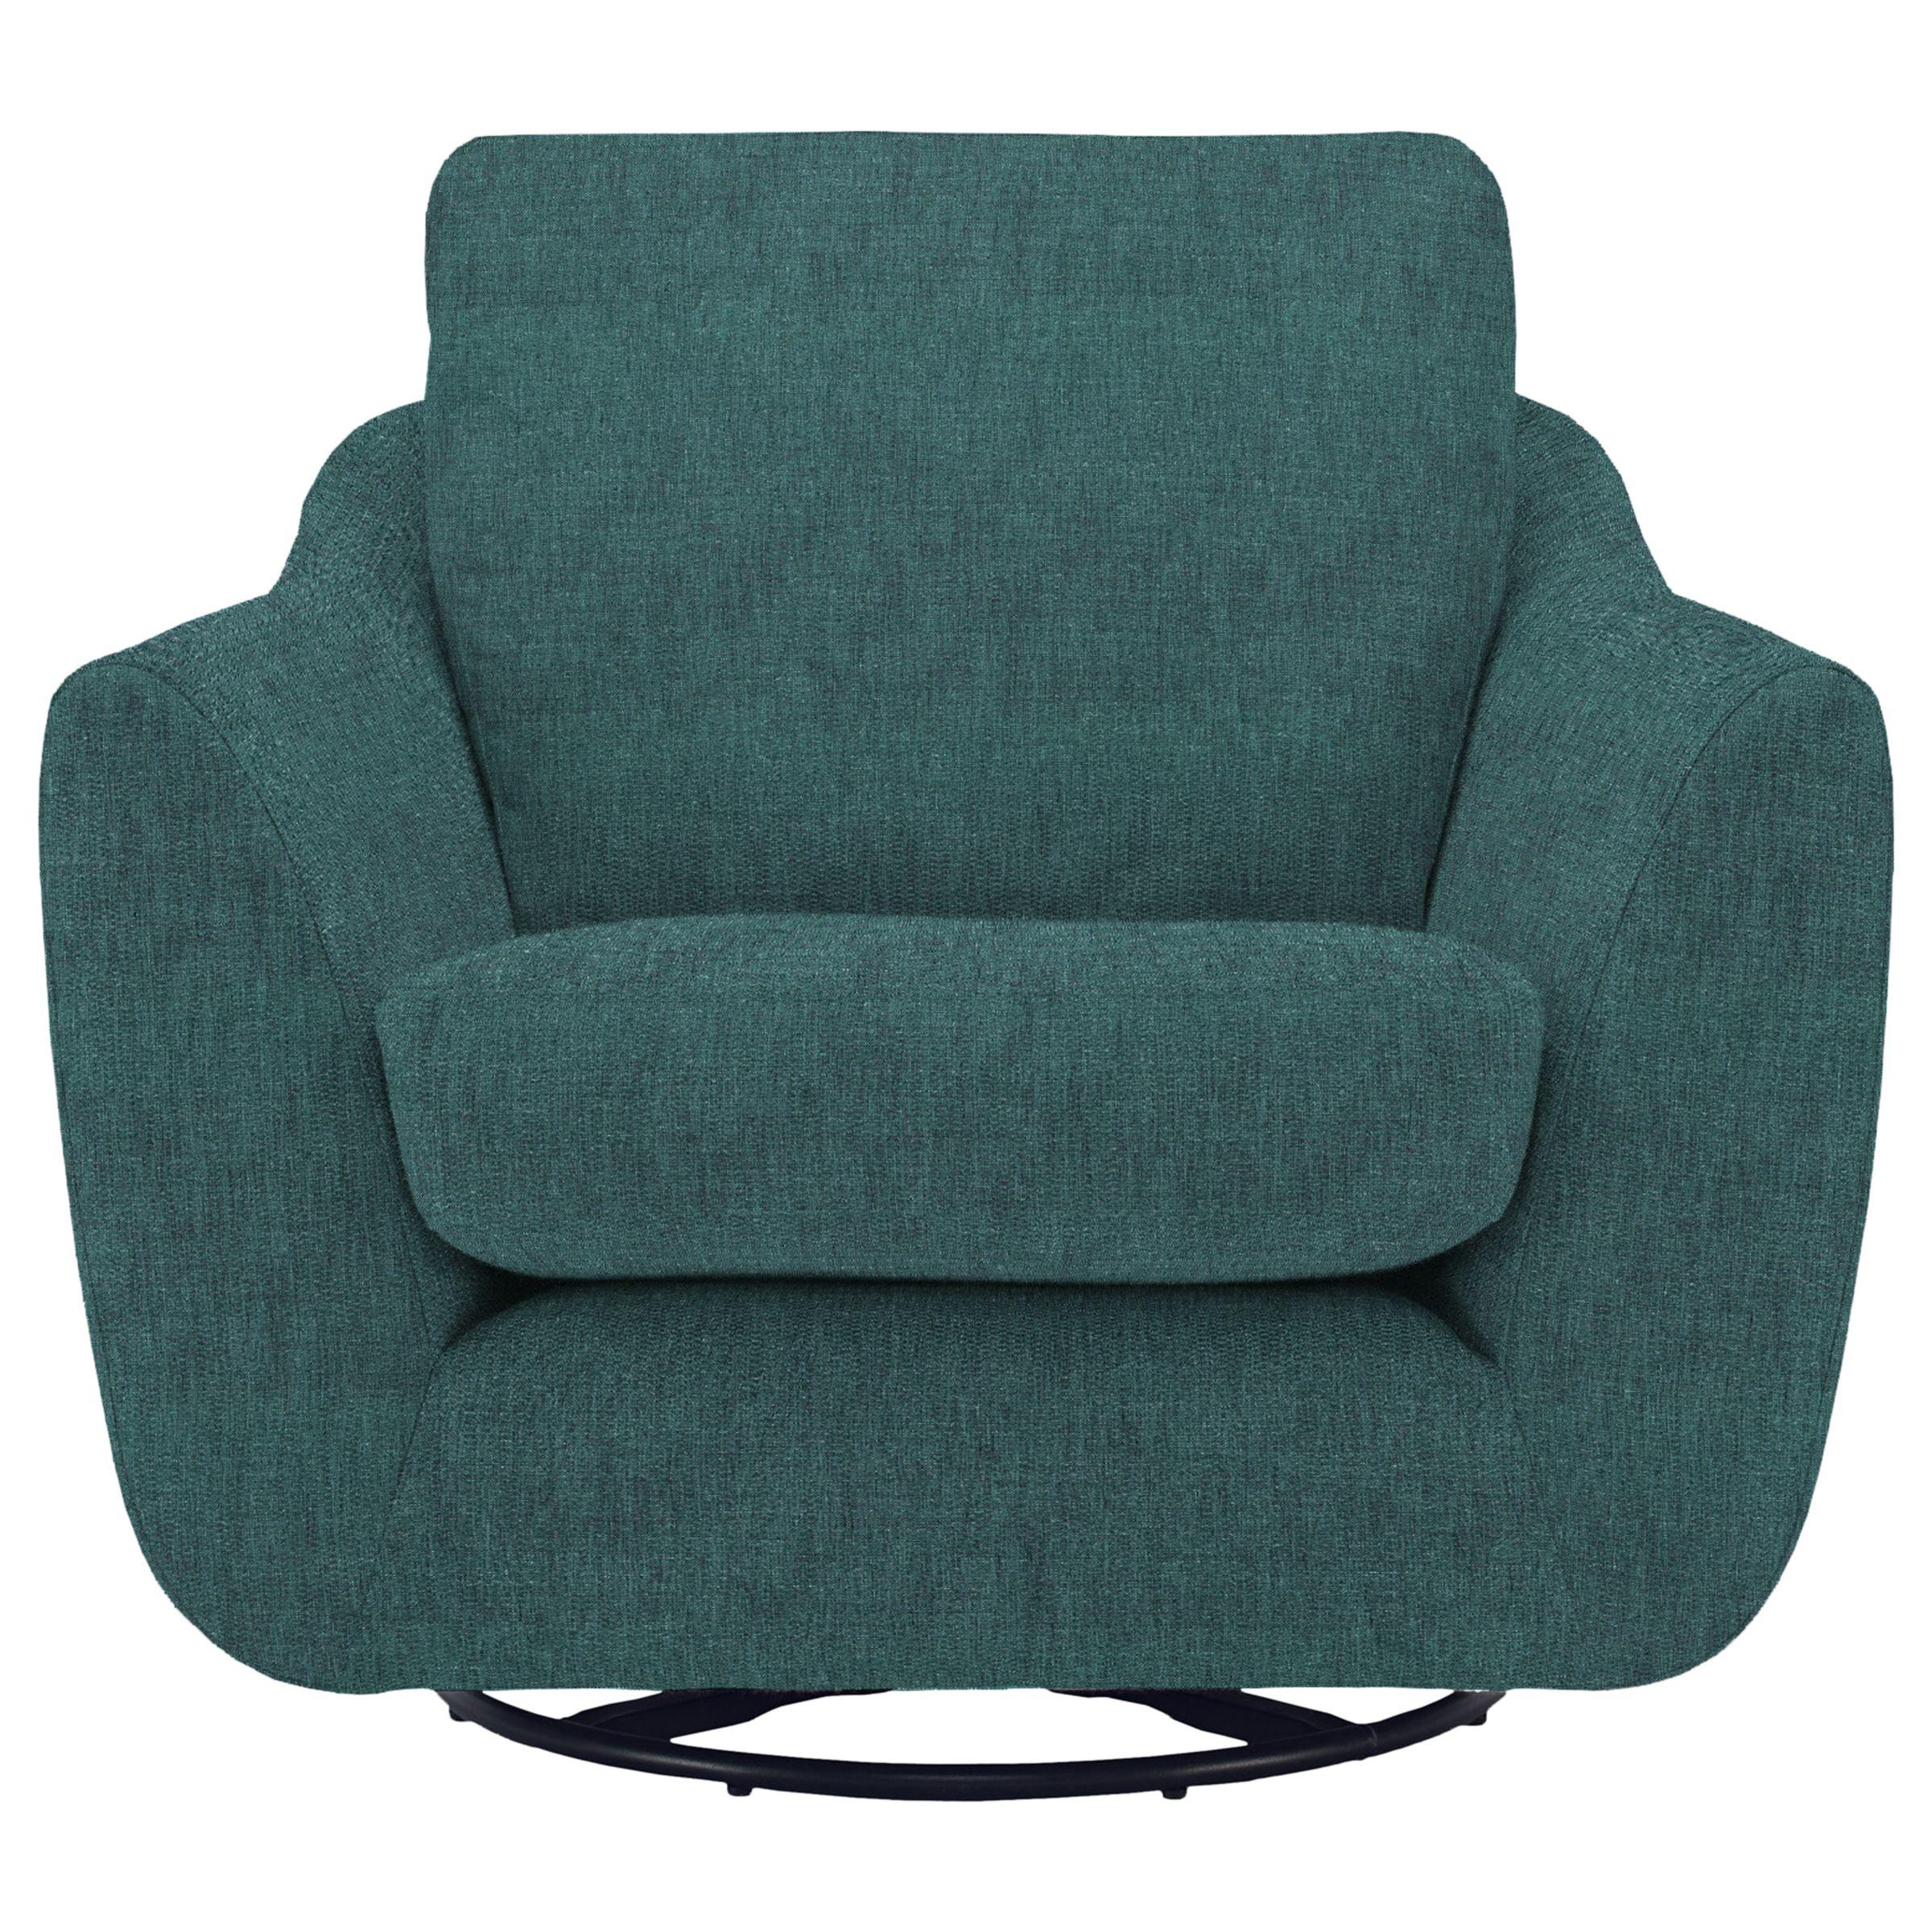 G Plan Vintage G Plan Vintage The Sixty Seven Swivel Armchair